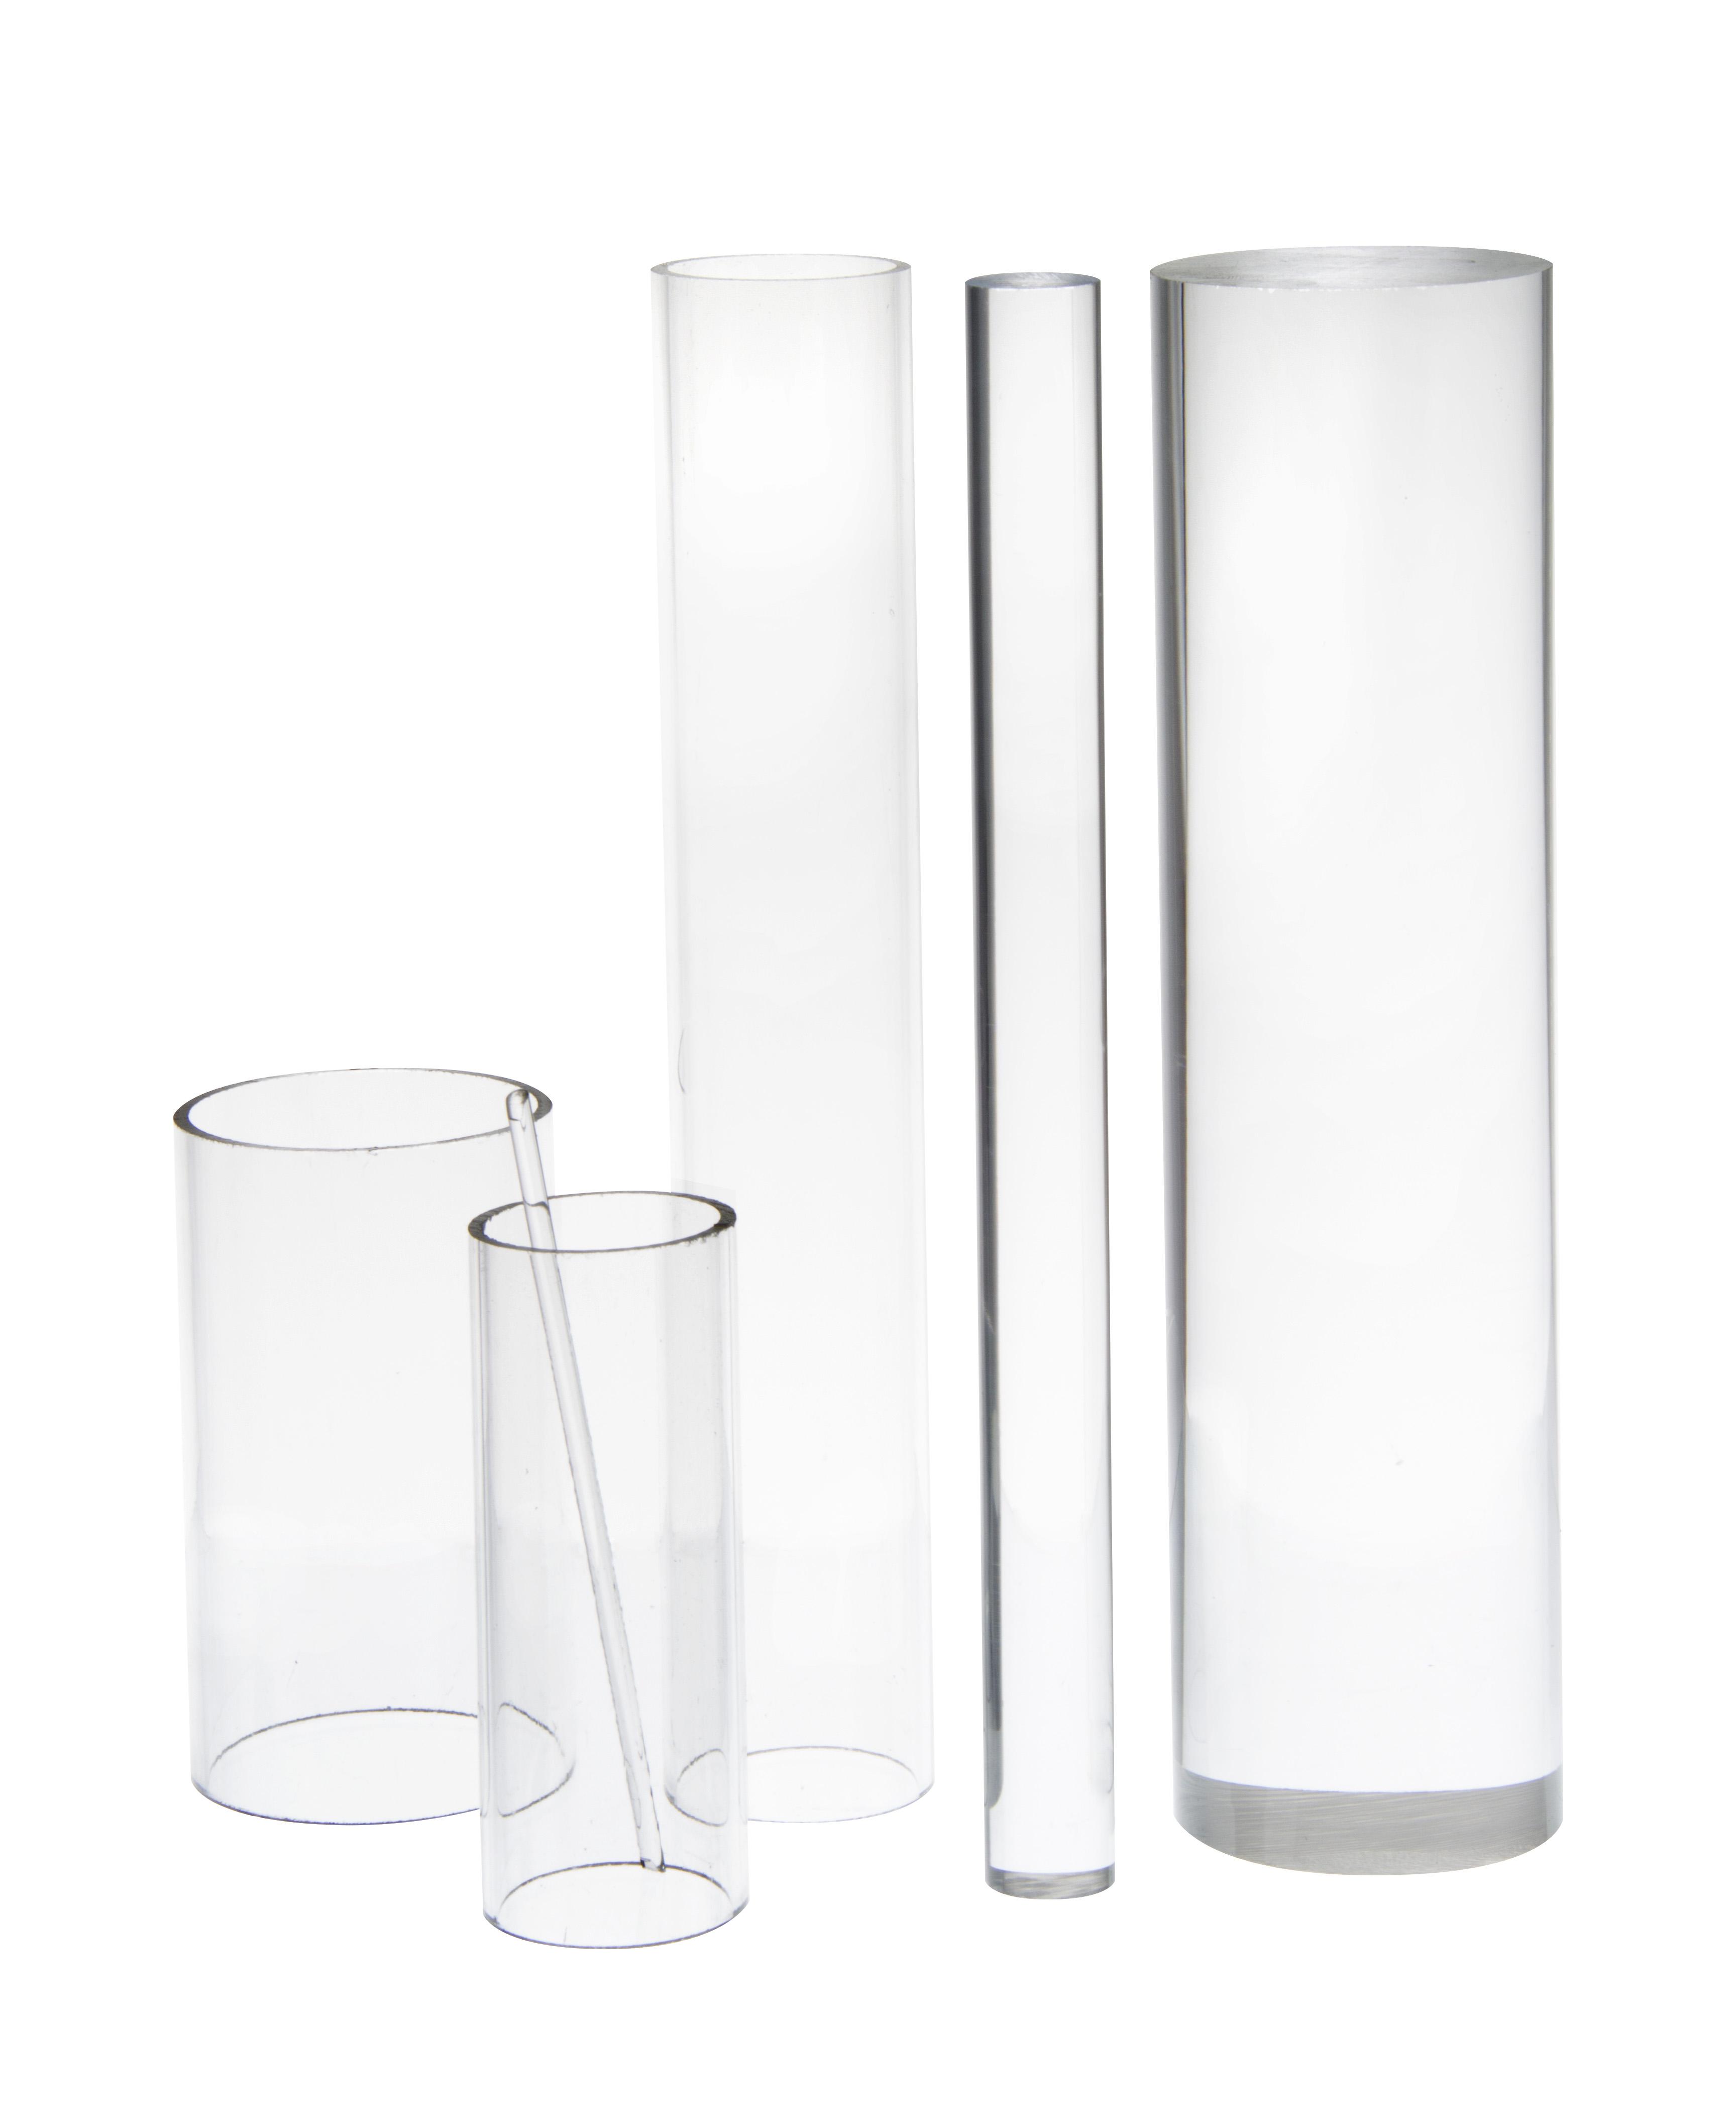 Polycarbonate Tube Acme Plastics Inc